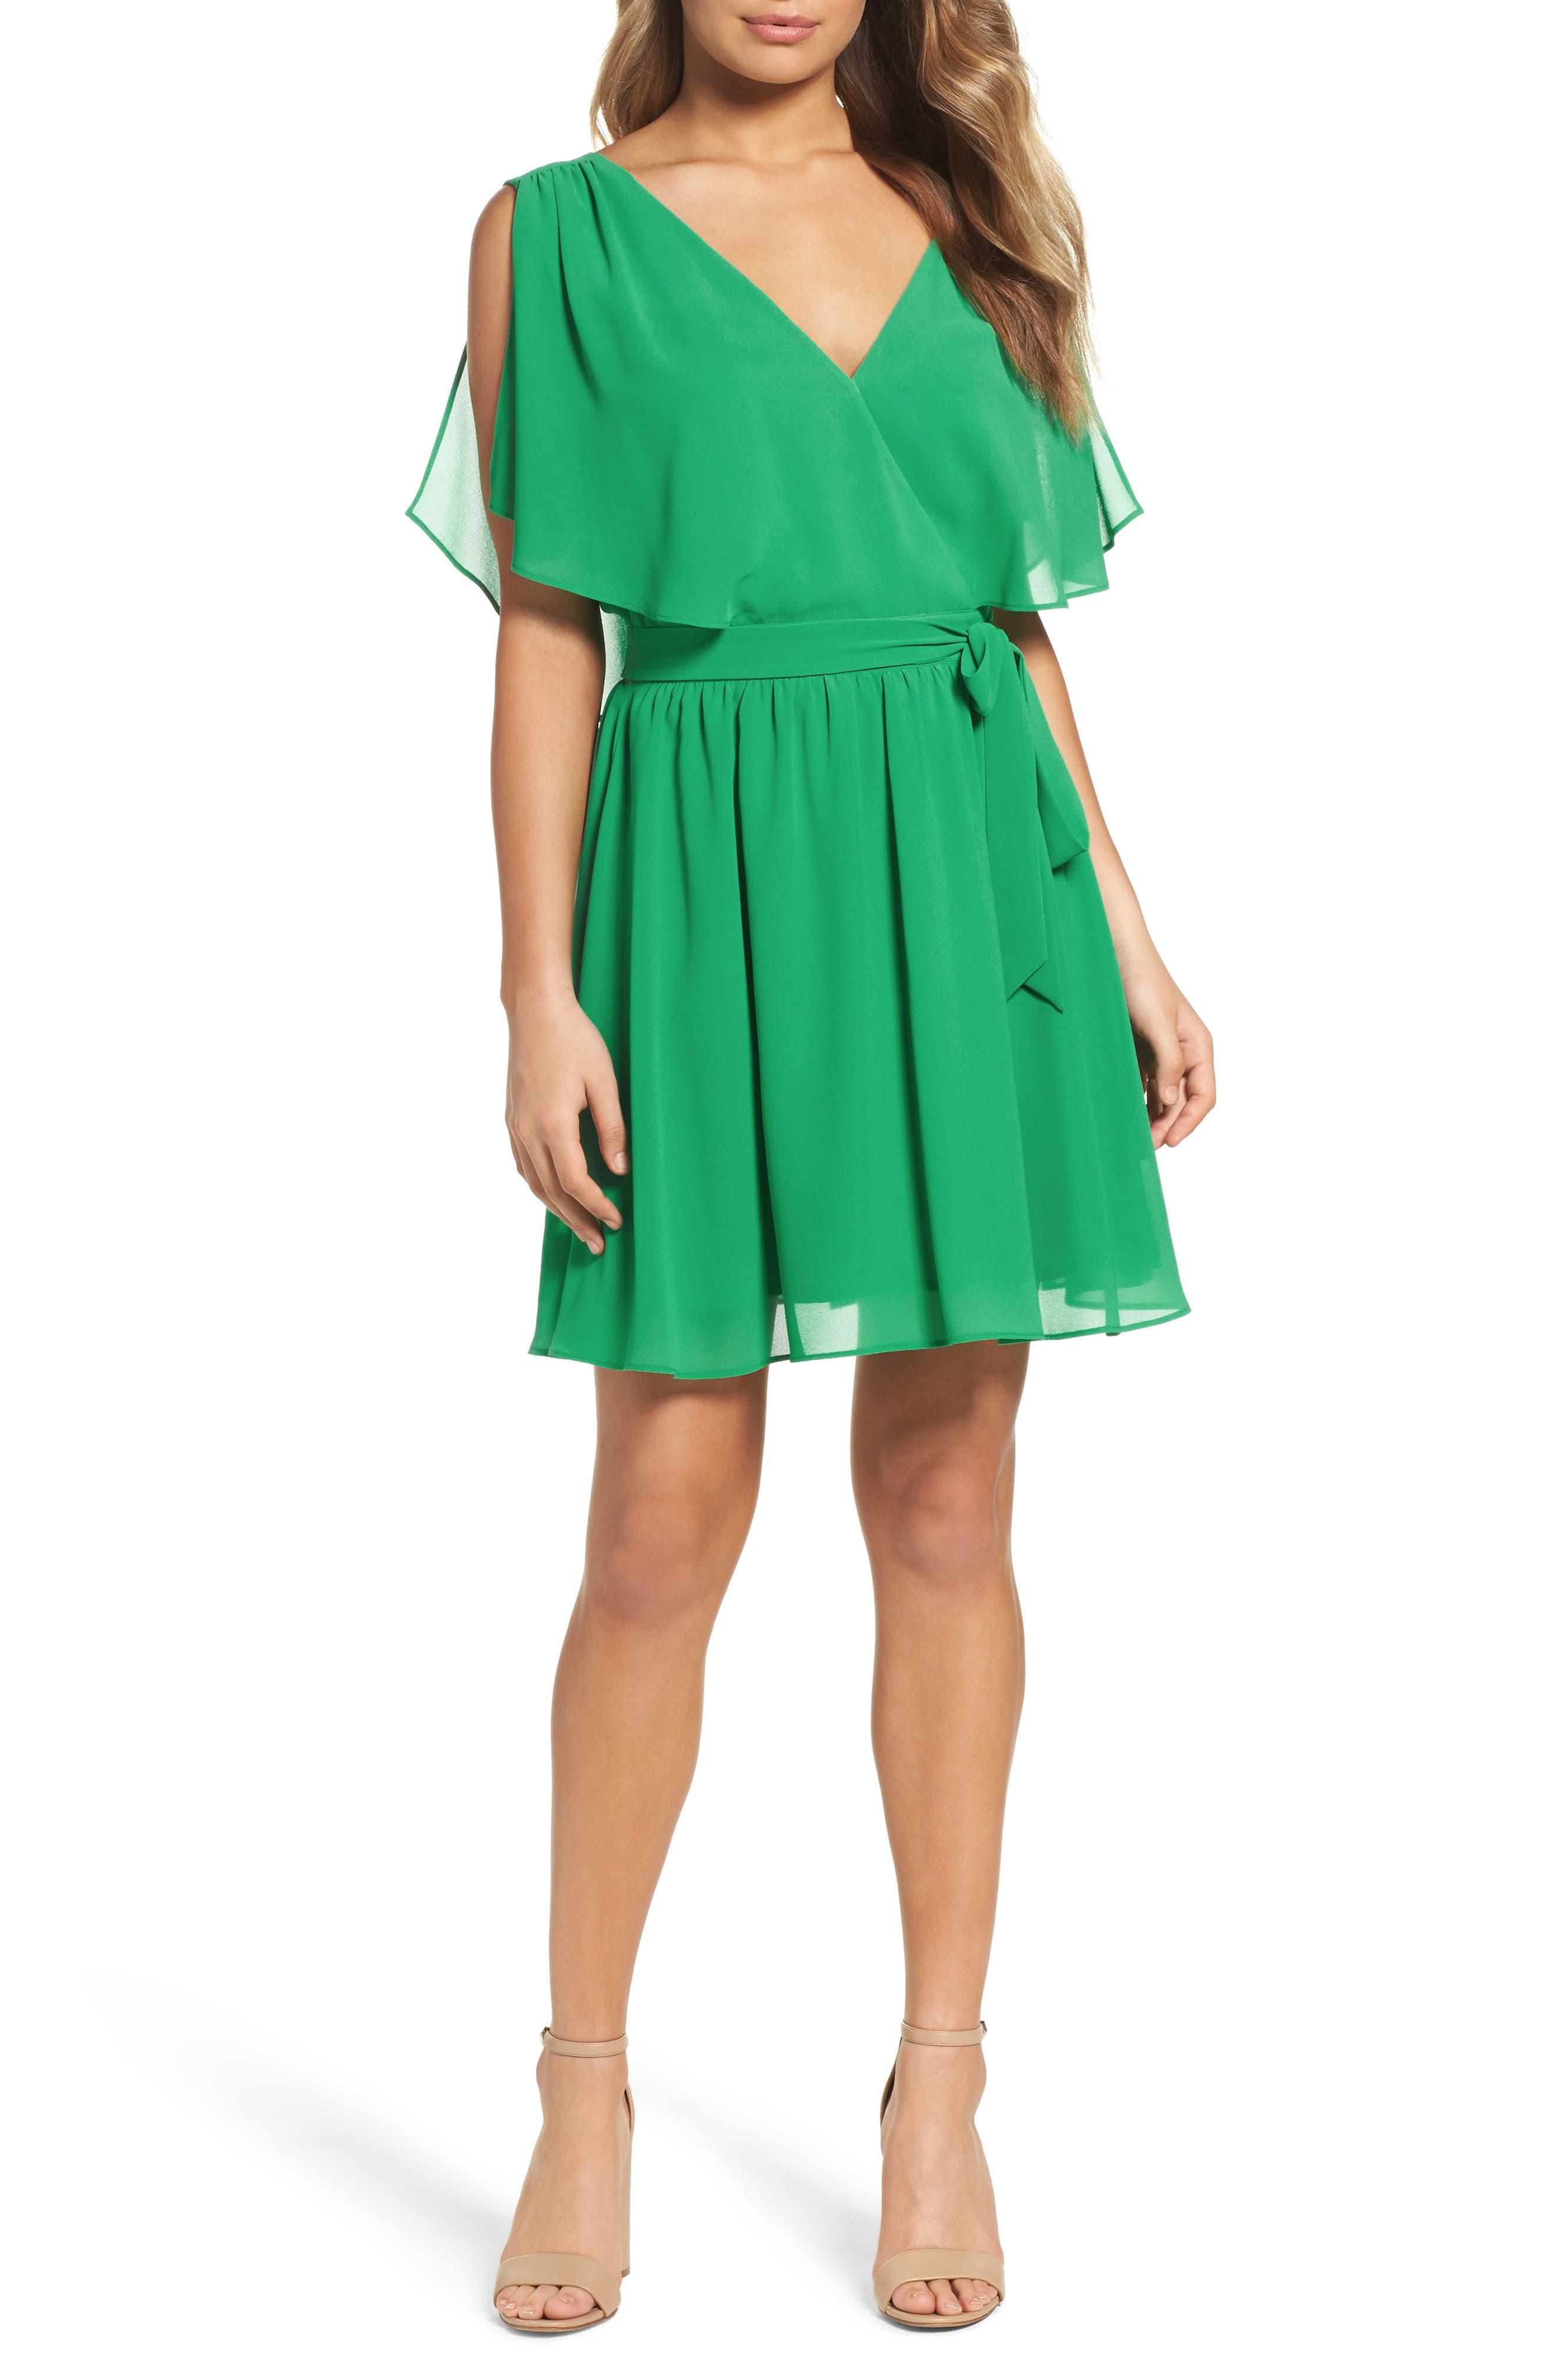 BB Dakota Catia Fit & Flare Dress,                             Main thumbnail 1, color,                             300